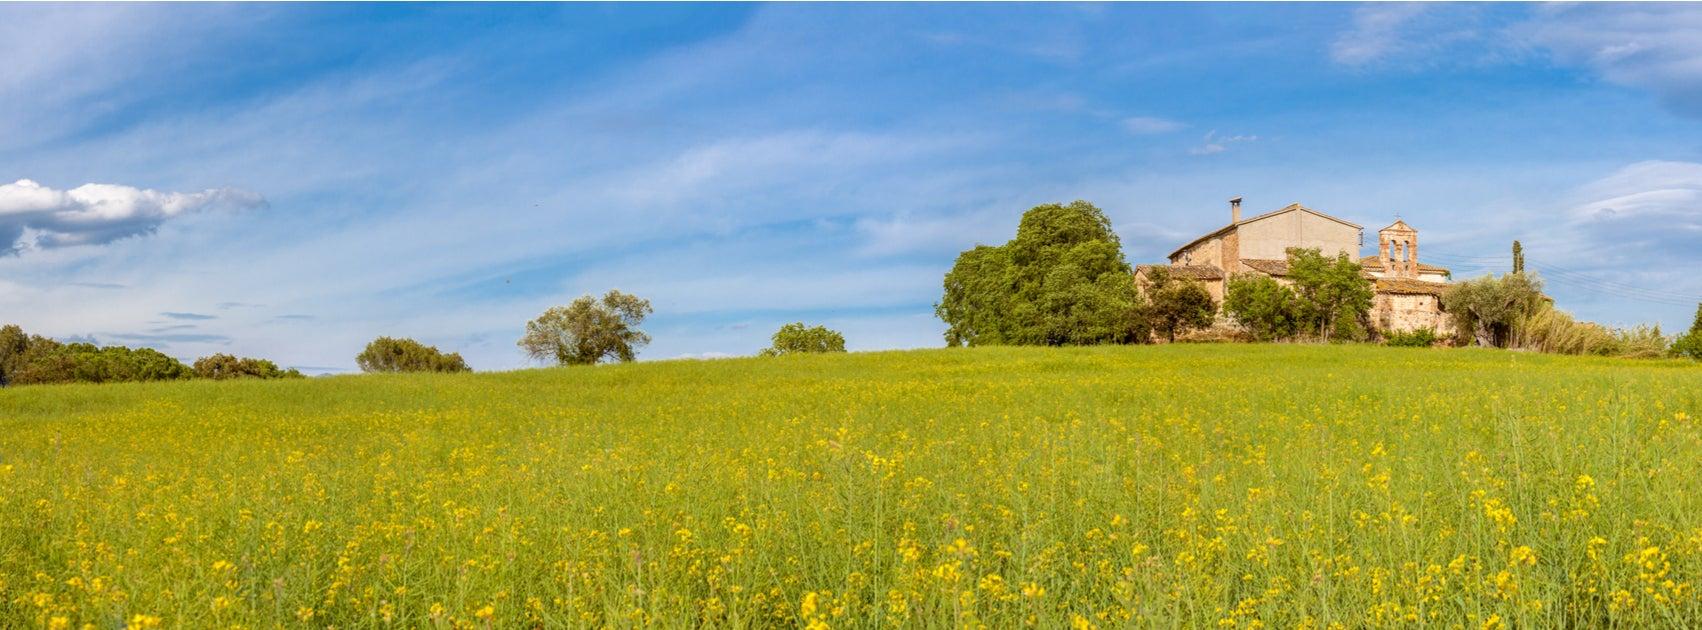 7 consejos para decorar tu casa de campo